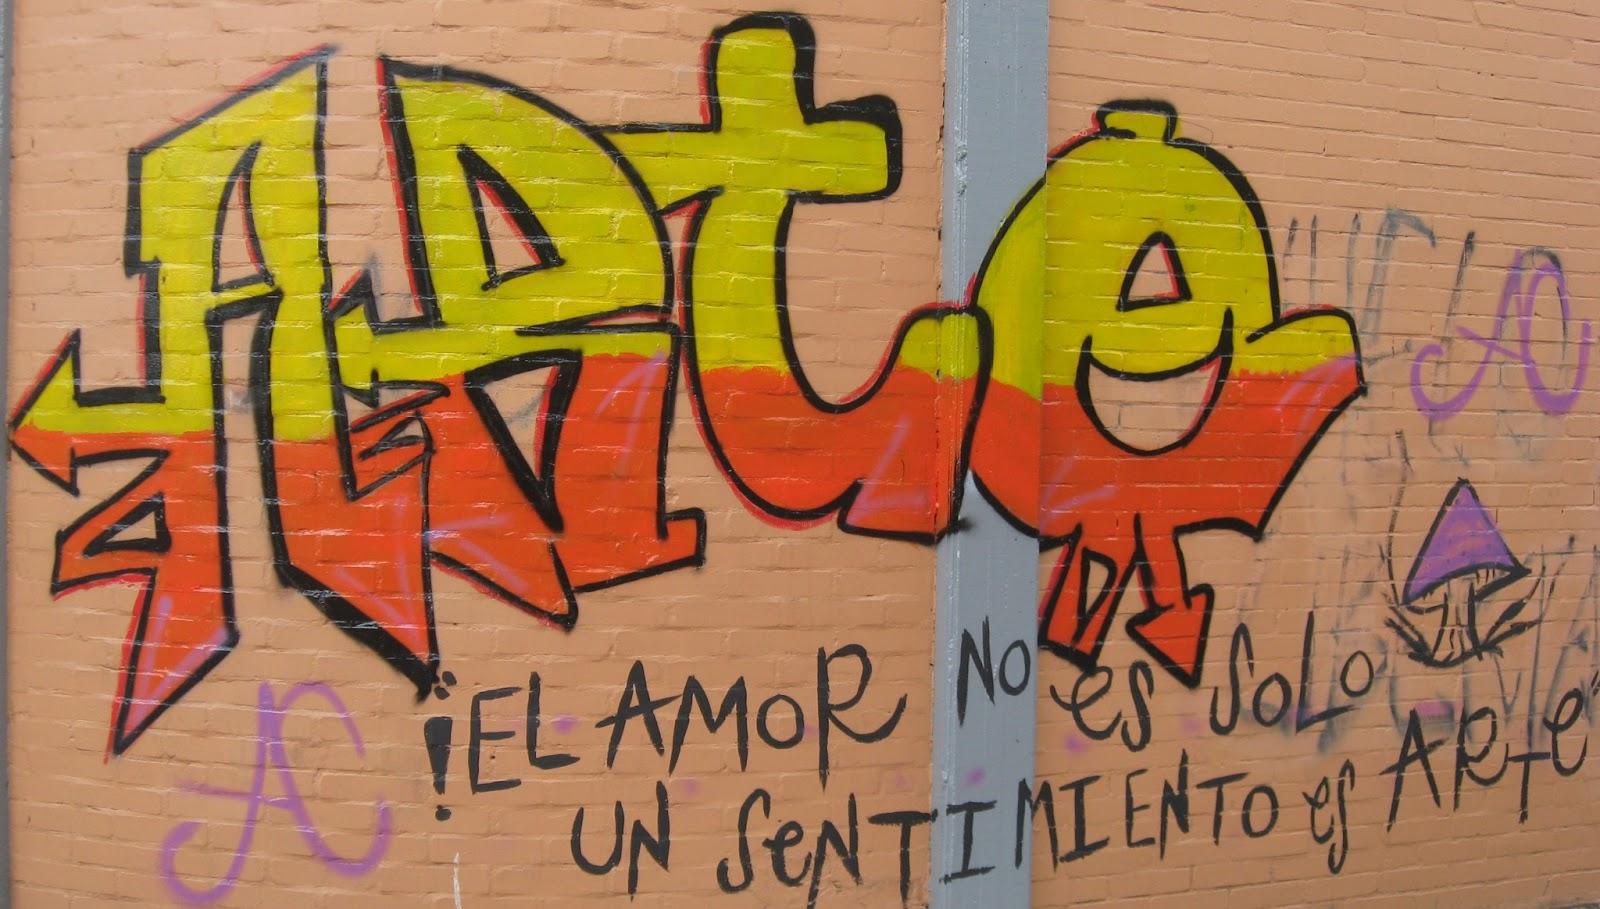 Street art graffiti letras y textos